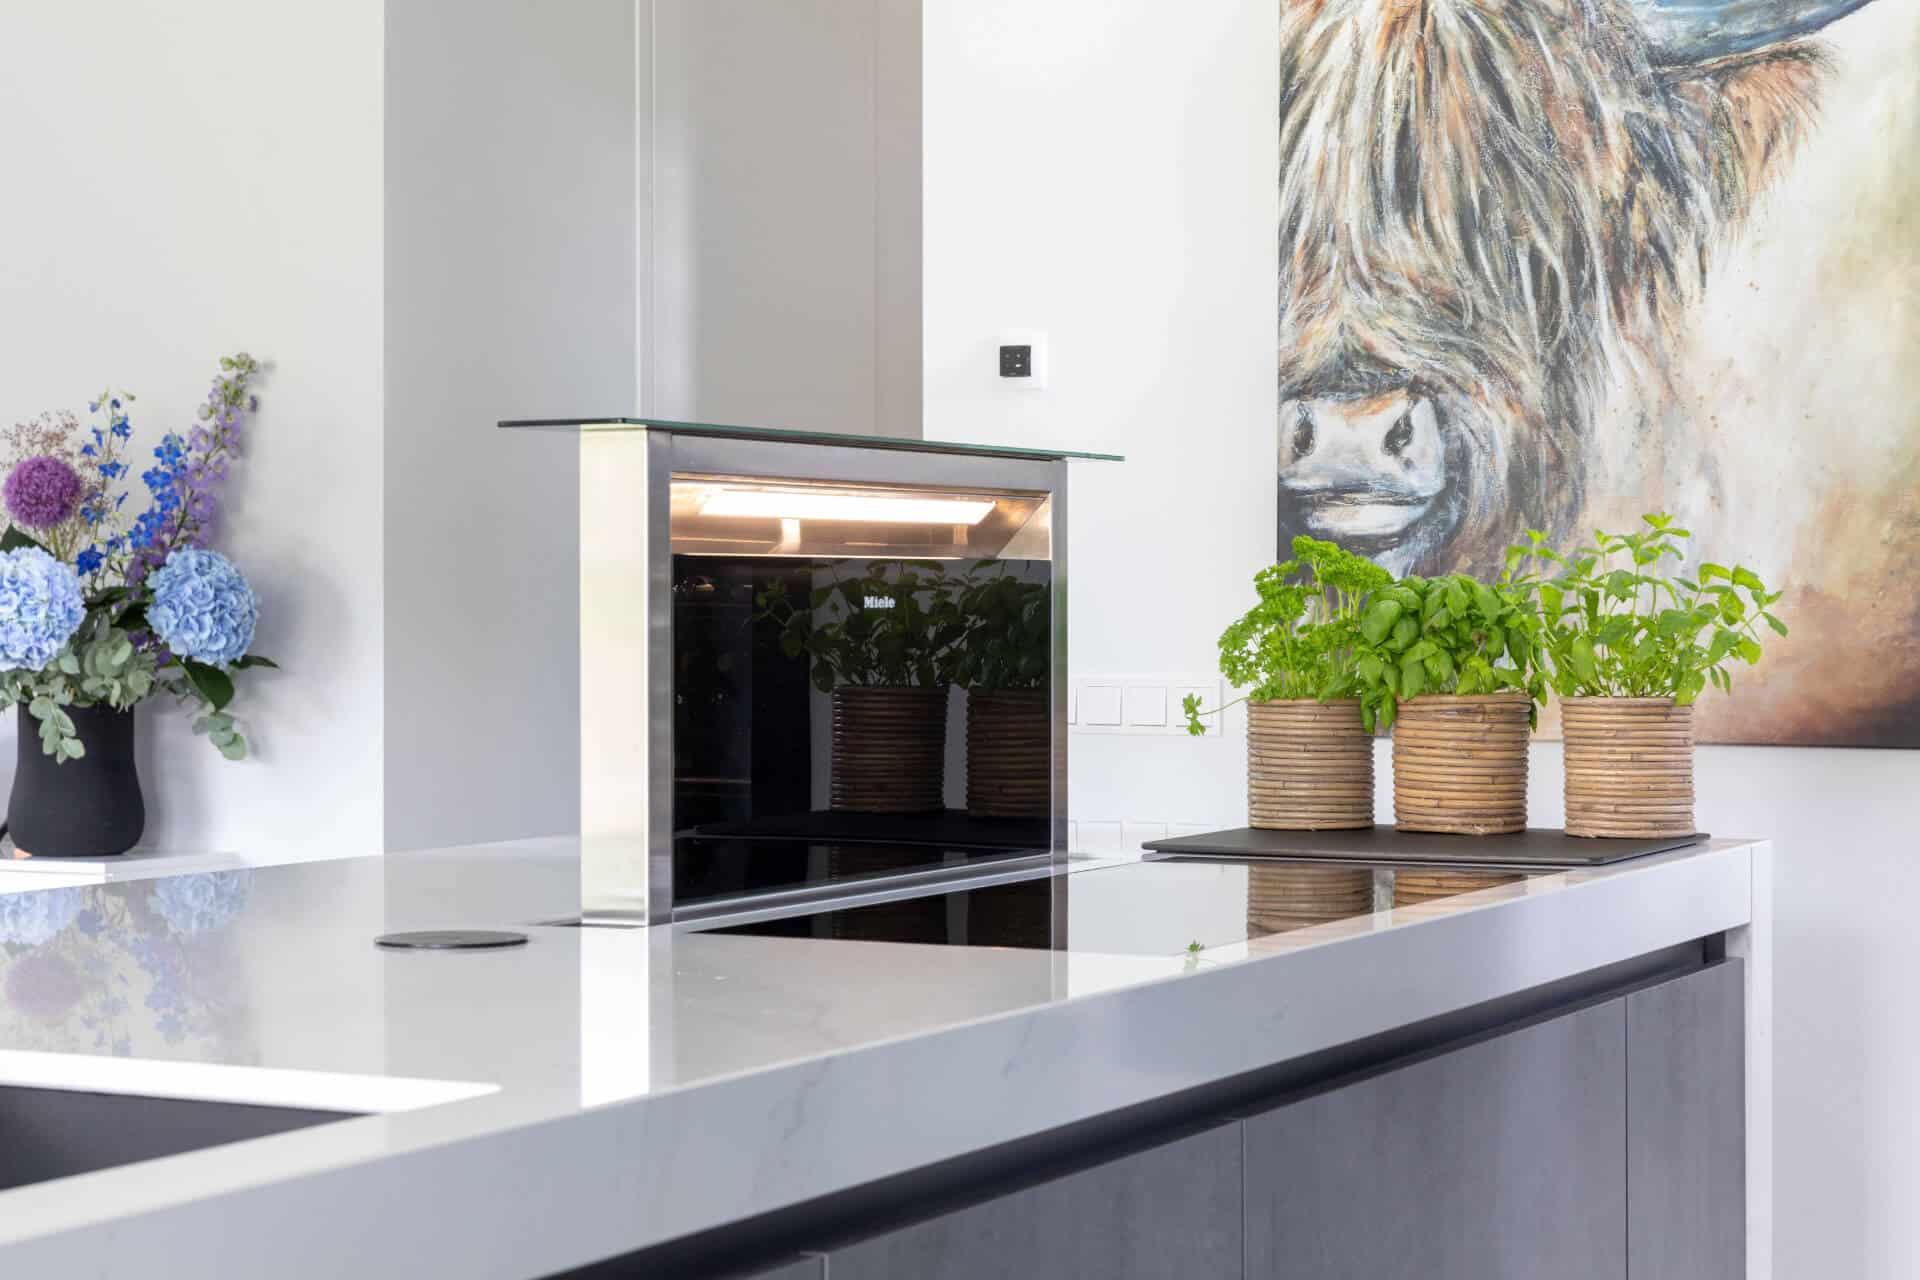 Luxe Design Keuken Lochem Van Ginkel Keukens Barneveld 026